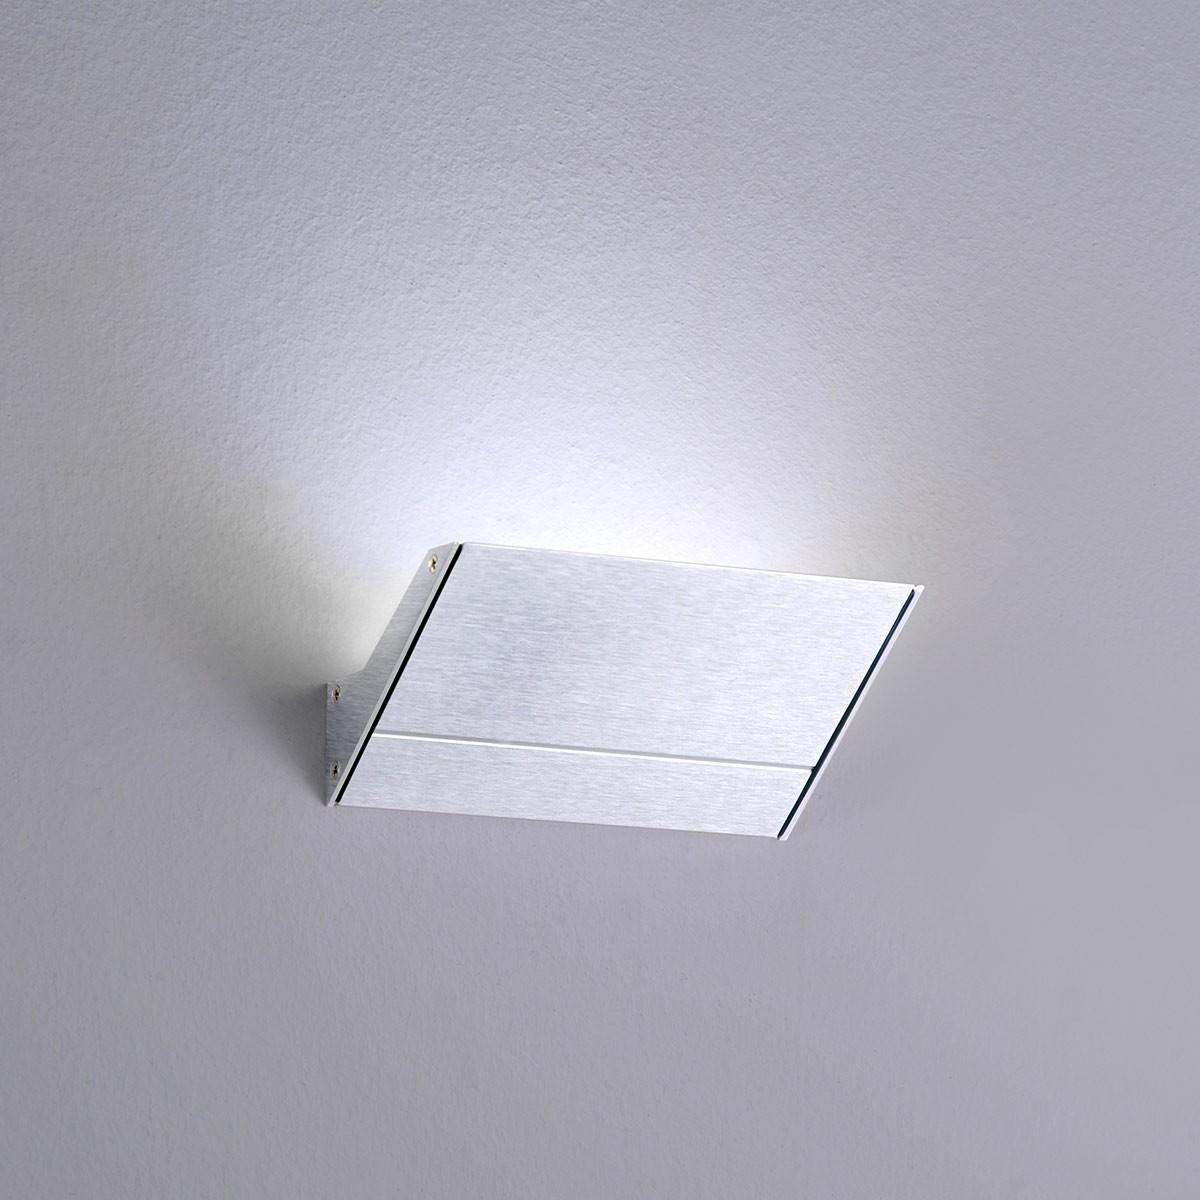 Milan Mini Neva Wandleuchte LED, 1-flg., Alu satiniert